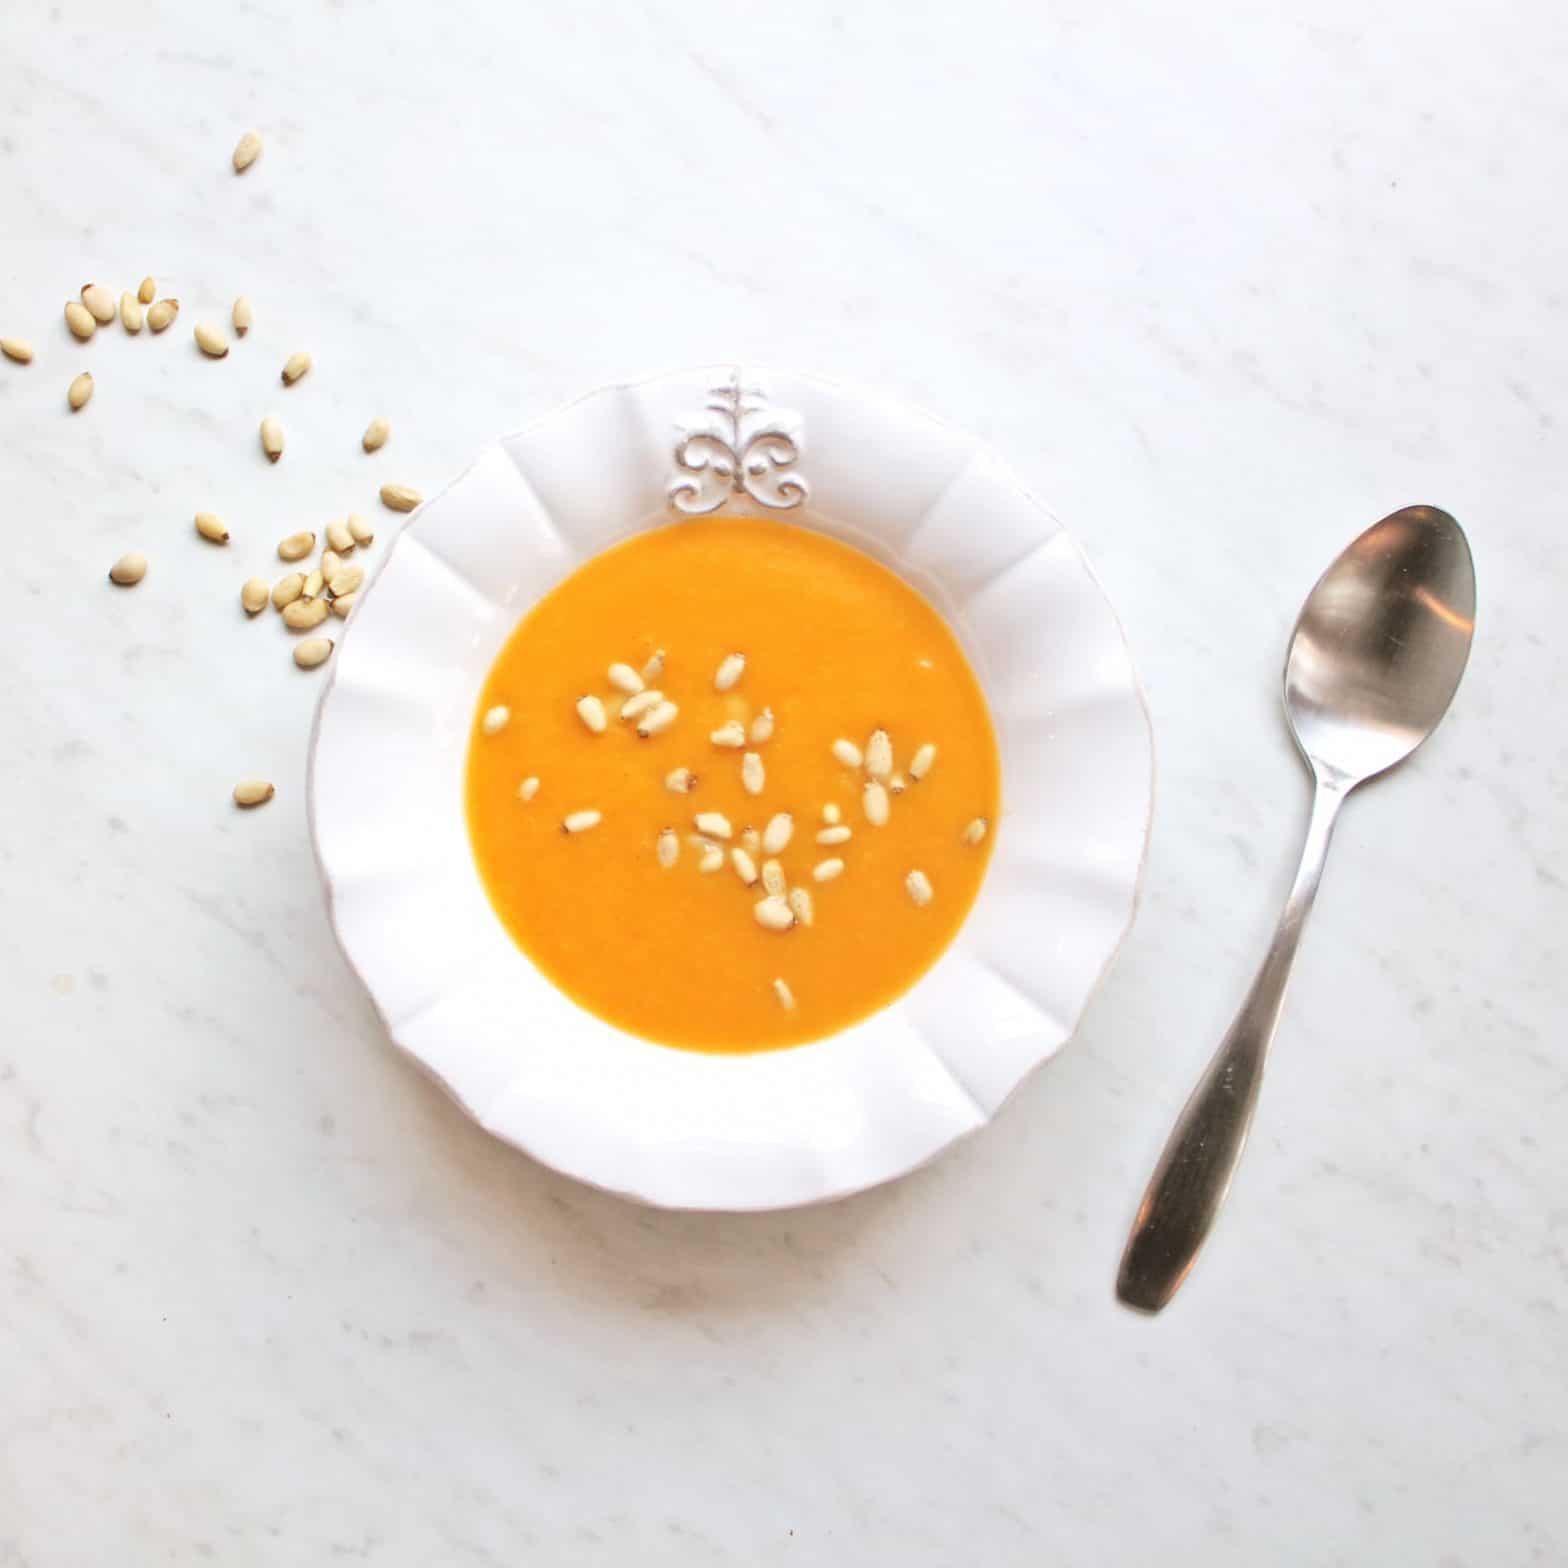 Paleo + Whole30 Orange Ginger Butternut Squash Soup Recipe